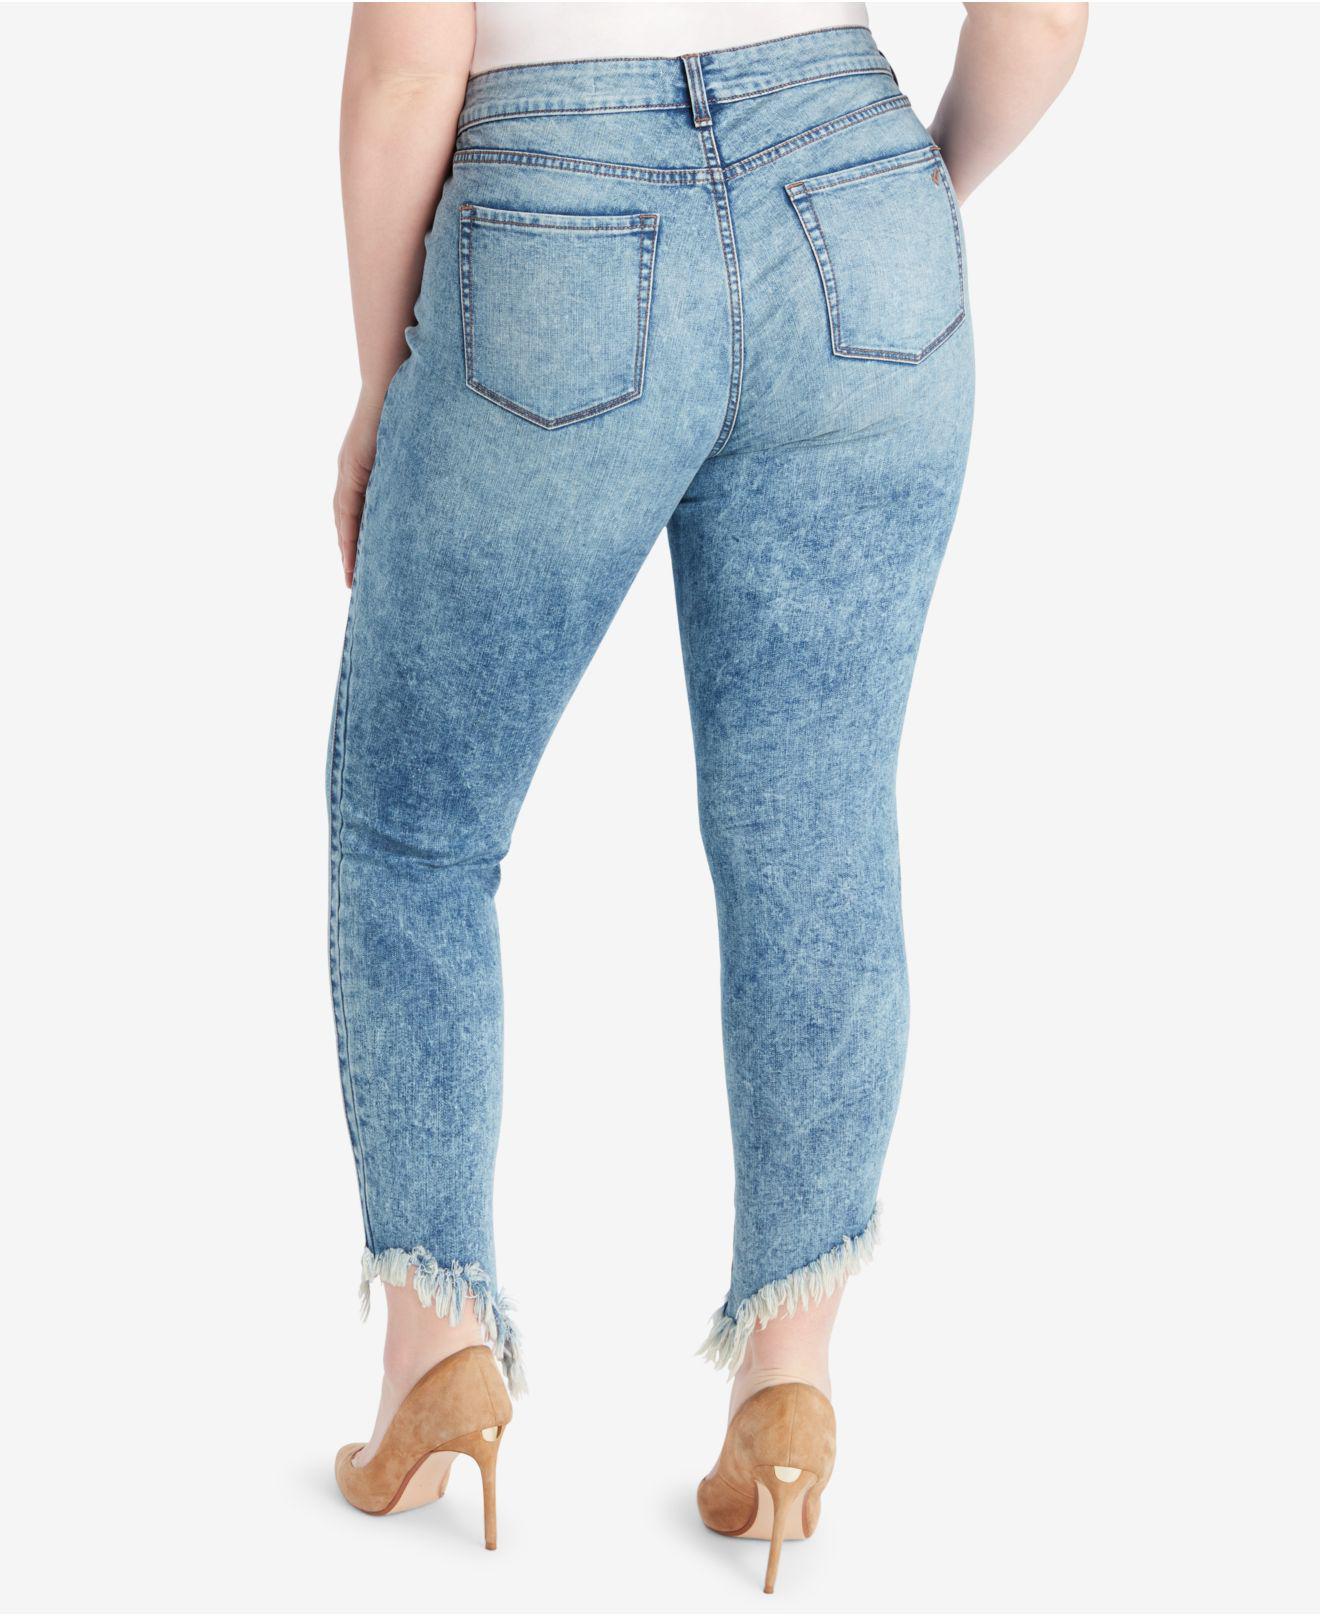 78827e75a5d Lyst - William Rast Plus Size Raw-hem Skinny Jeans in Blue